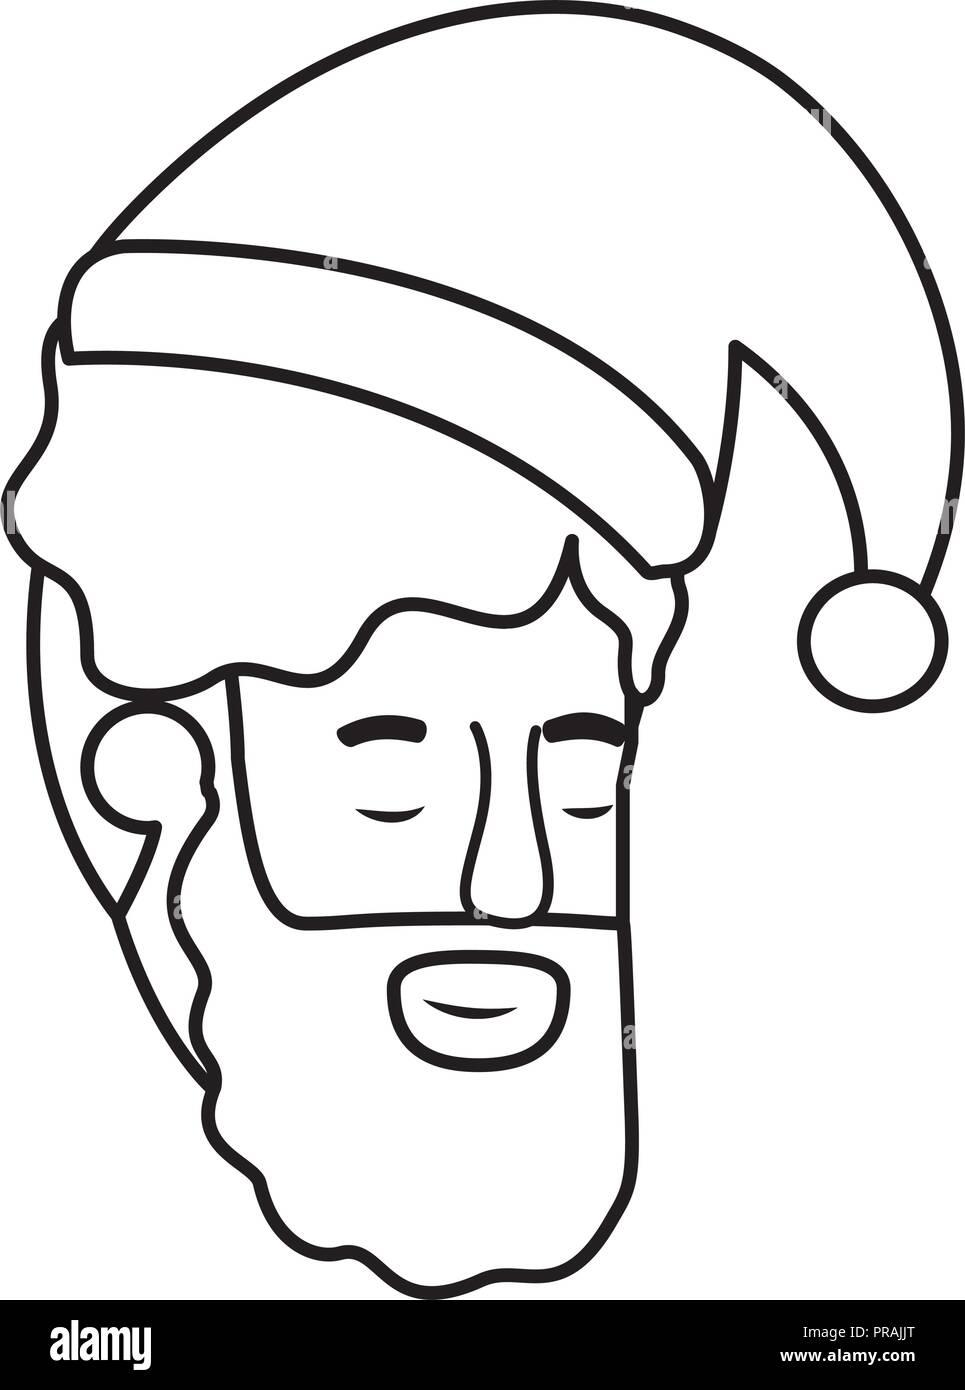 head of man sleeping avatar character - Stock Image